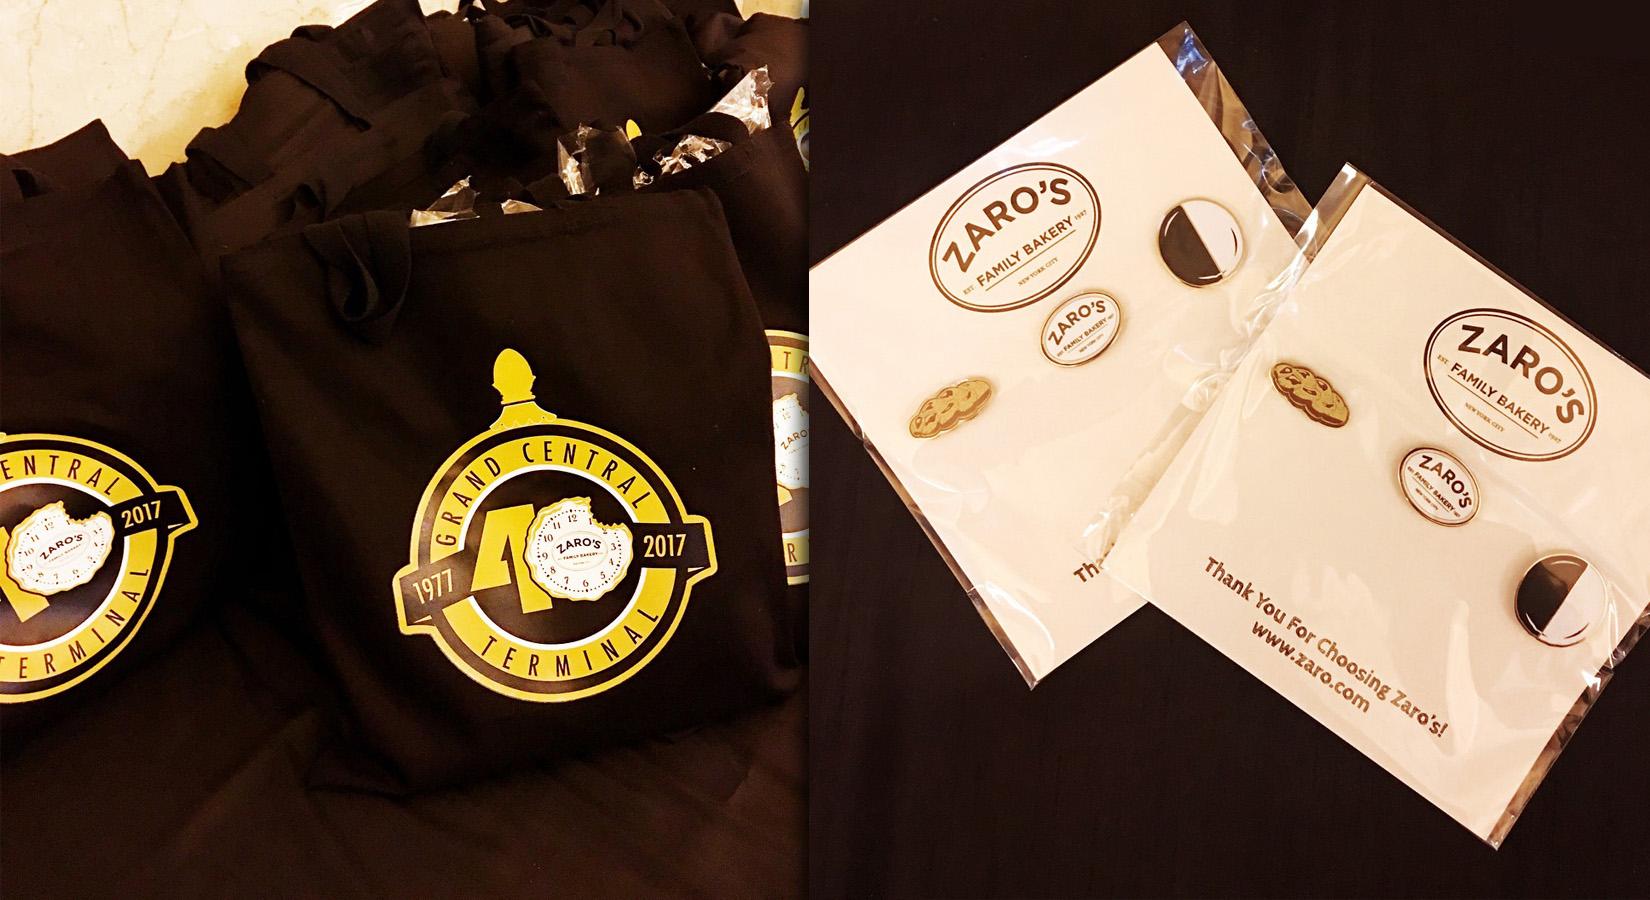 #CreatedByCaptiv8: Zaro's Family Bakery 40th Celebration Merchandise